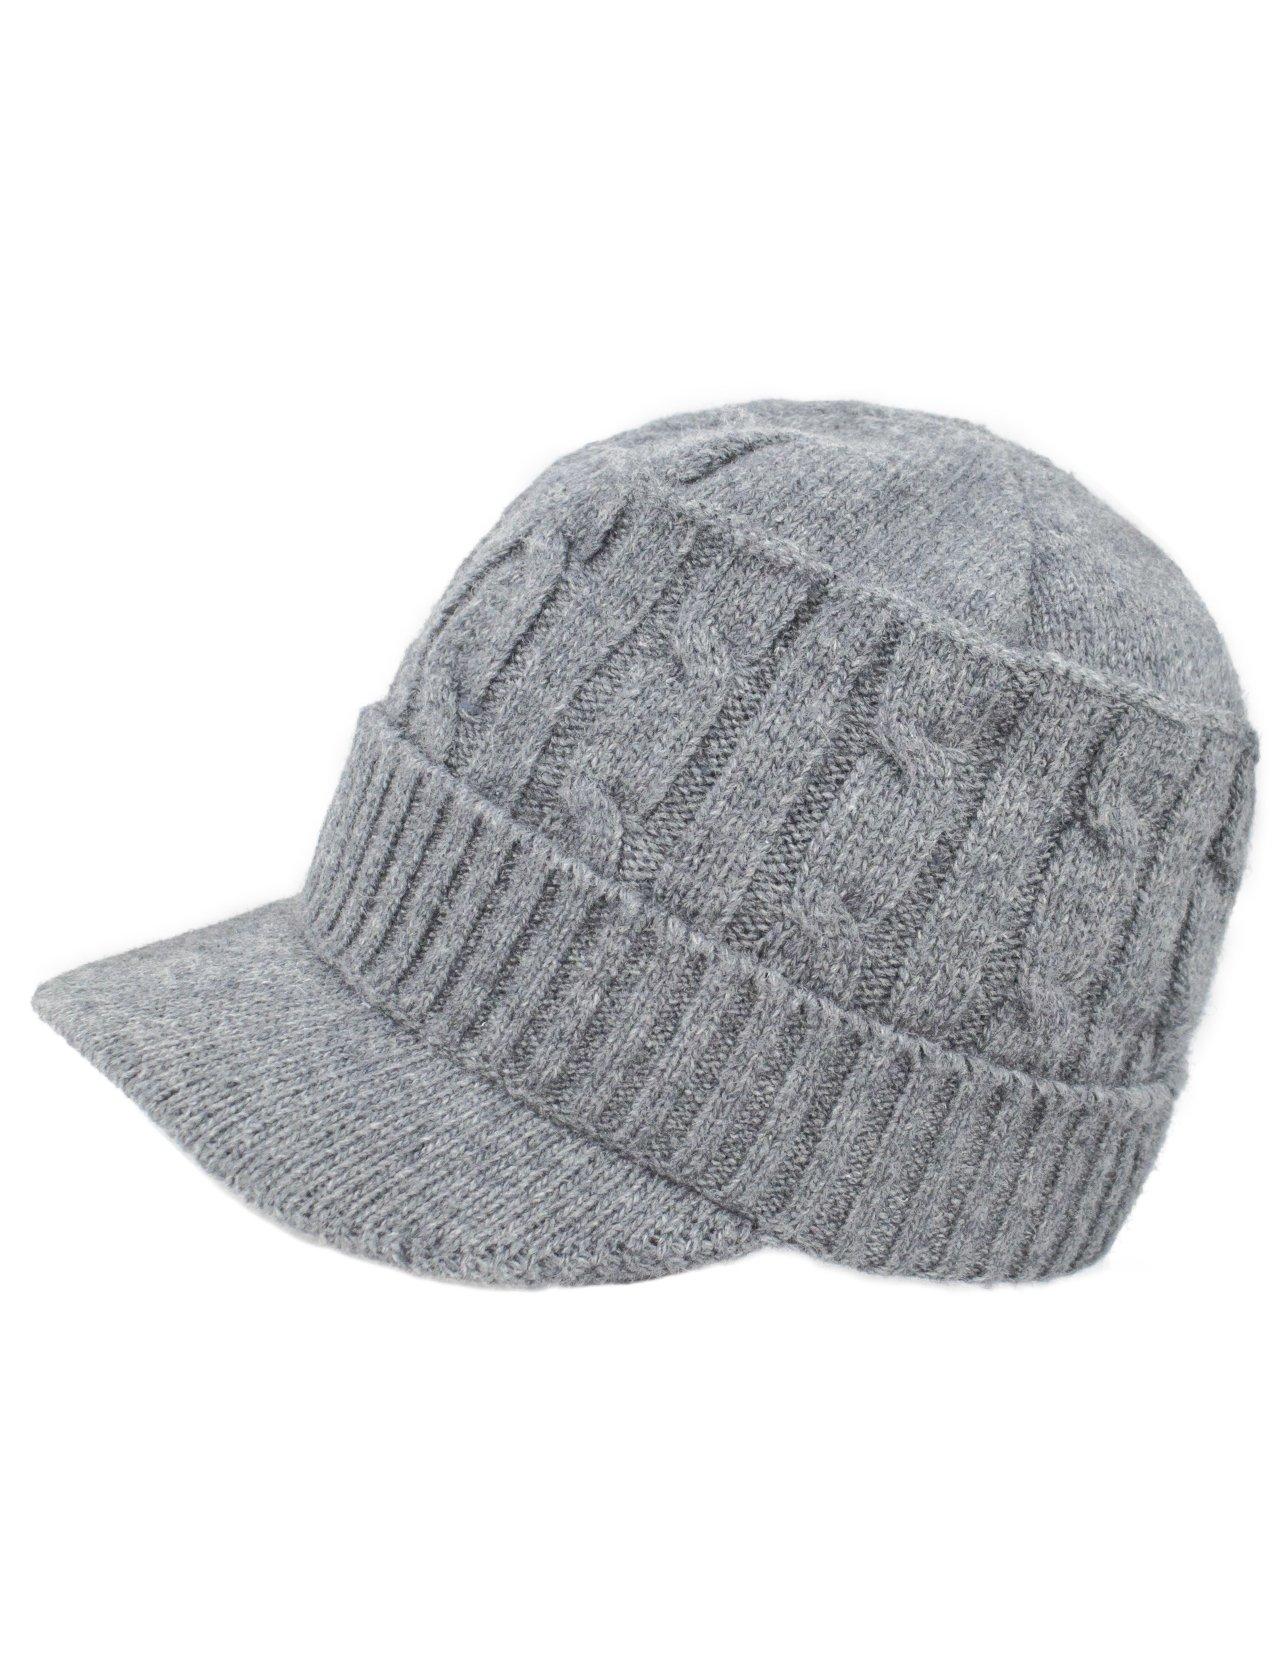 Dahlia Women's Soft & Warm Velour Lined Cable Knit Visor Cap Hat - Light Gray by Dahlia